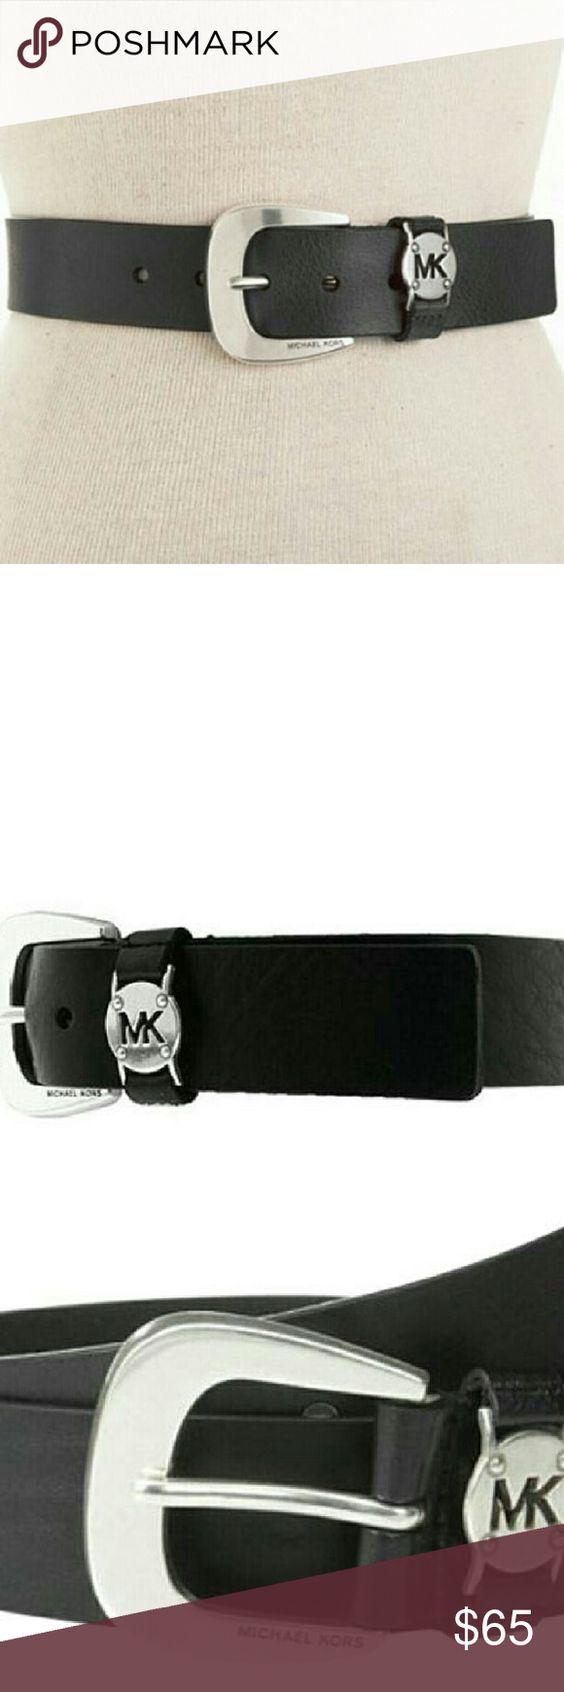 Michael Kors Belt Leather Belt With MK Cutout Logo Disc Belt Size X-Small Michael Kors Accessories Belts